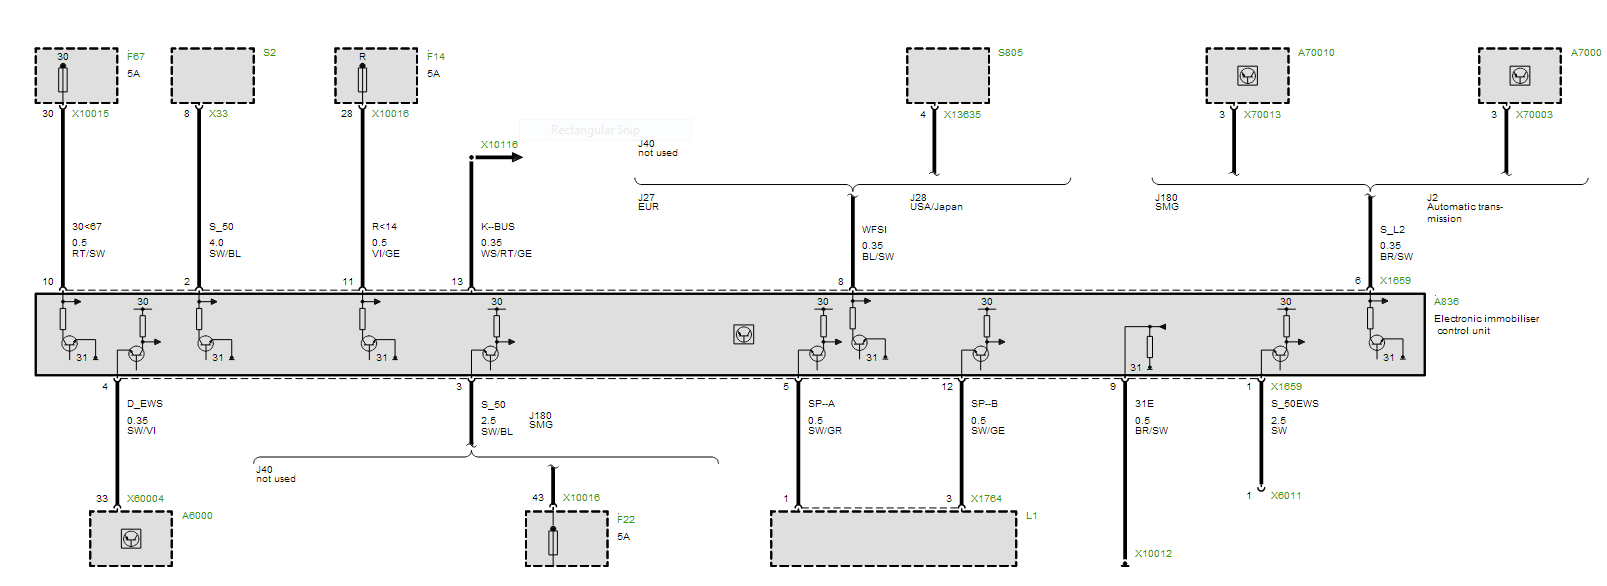 Peachy Bmw Ews Wiring Diagram 3 Wiring Diagram Wiring Cloud Domeilariaidewilluminateatxorg